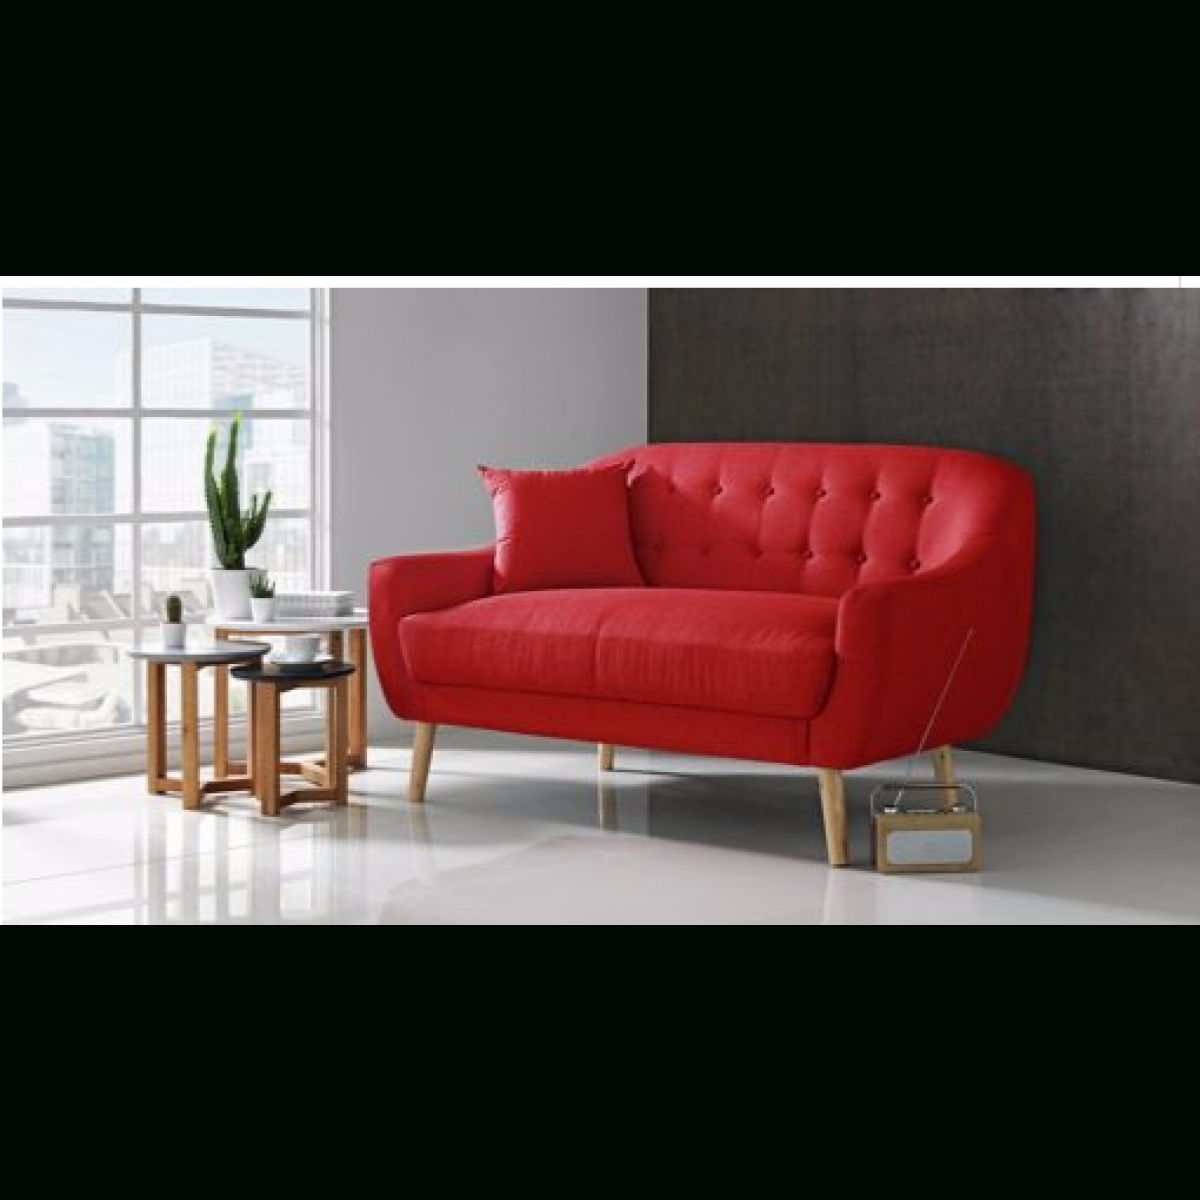 20 Photos Retro Sofas And Chairs Sofa Ideas